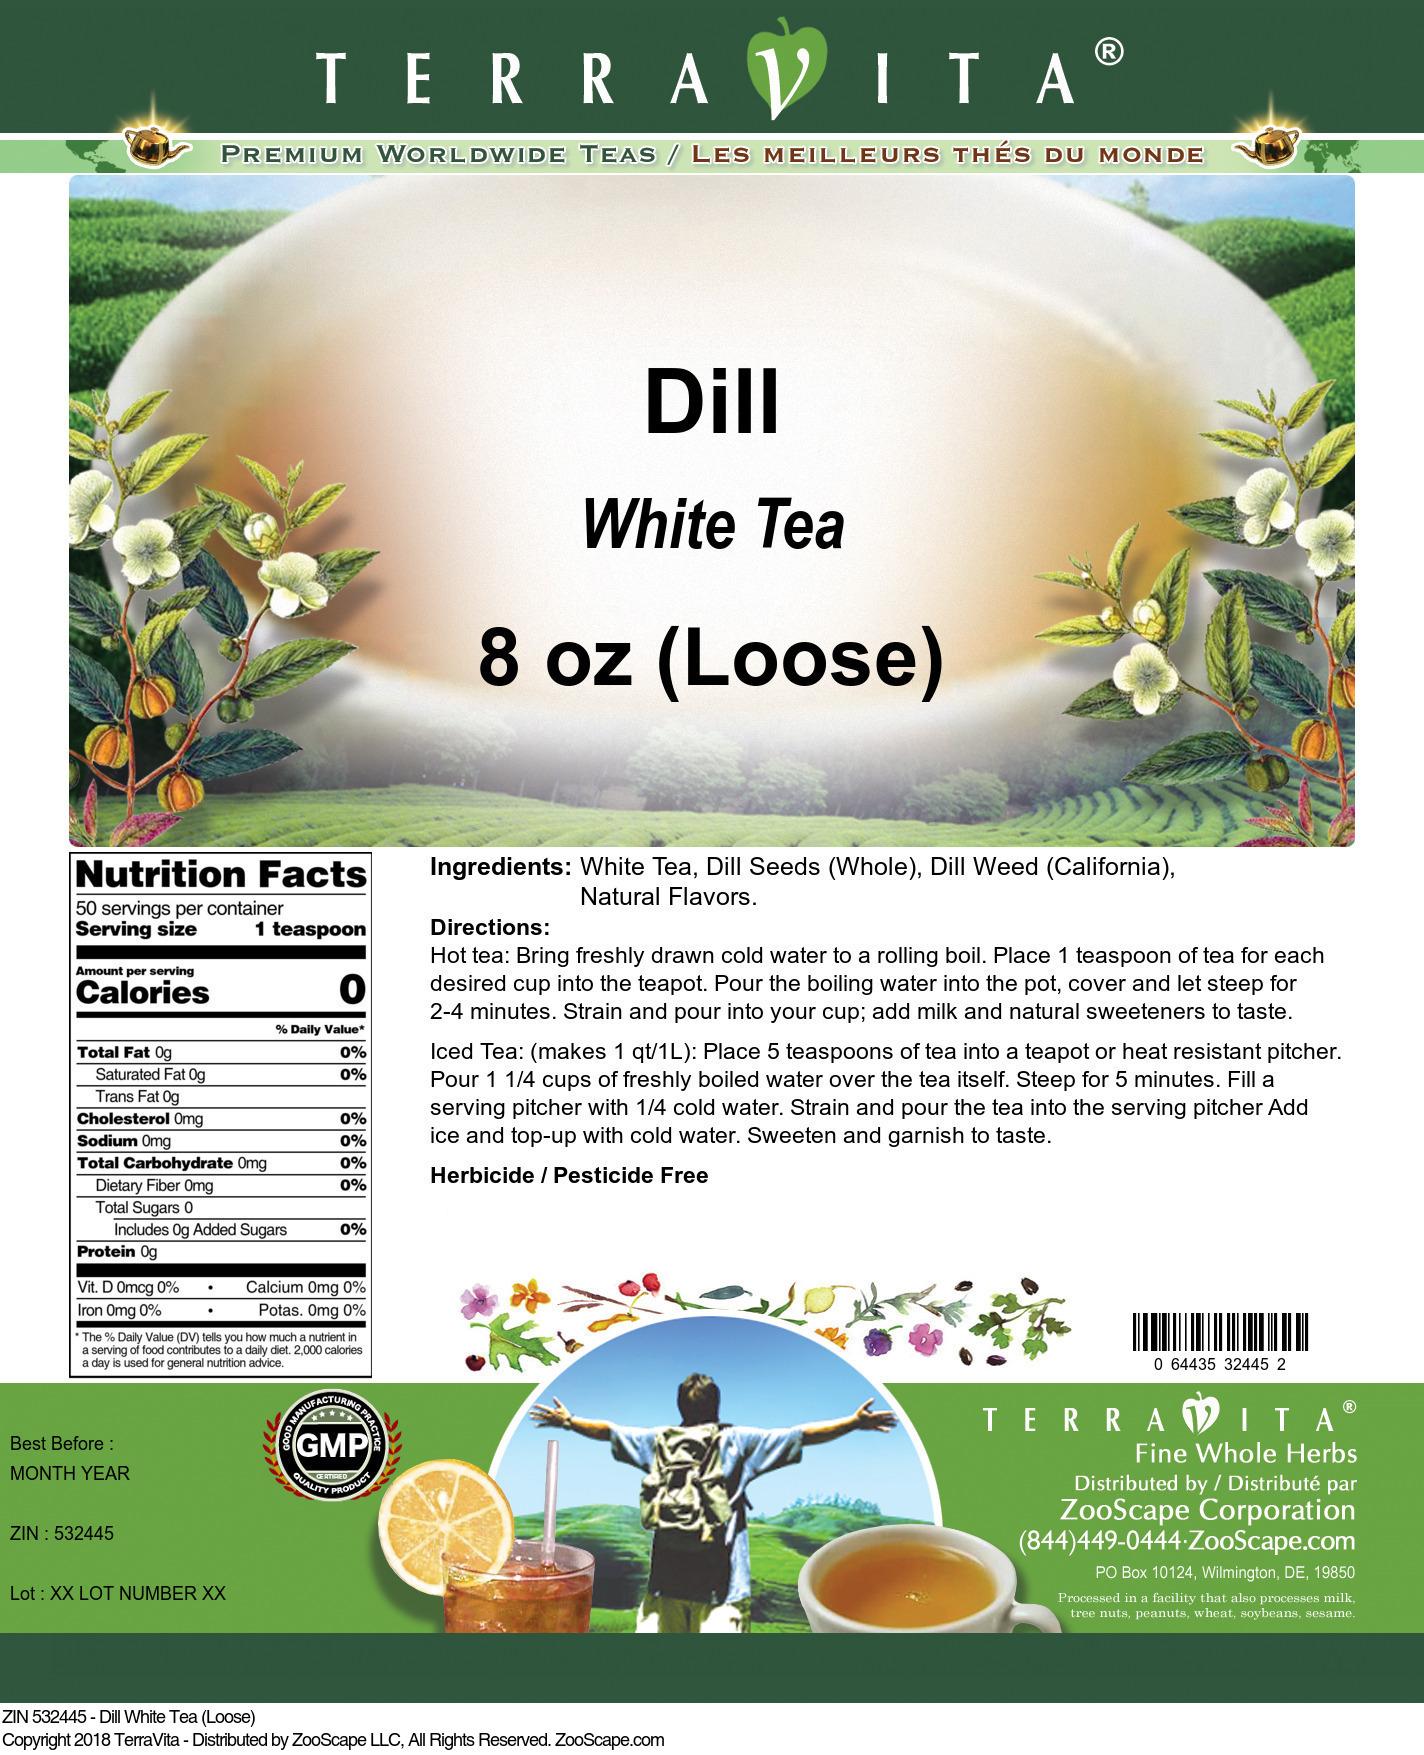 Dill White Tea